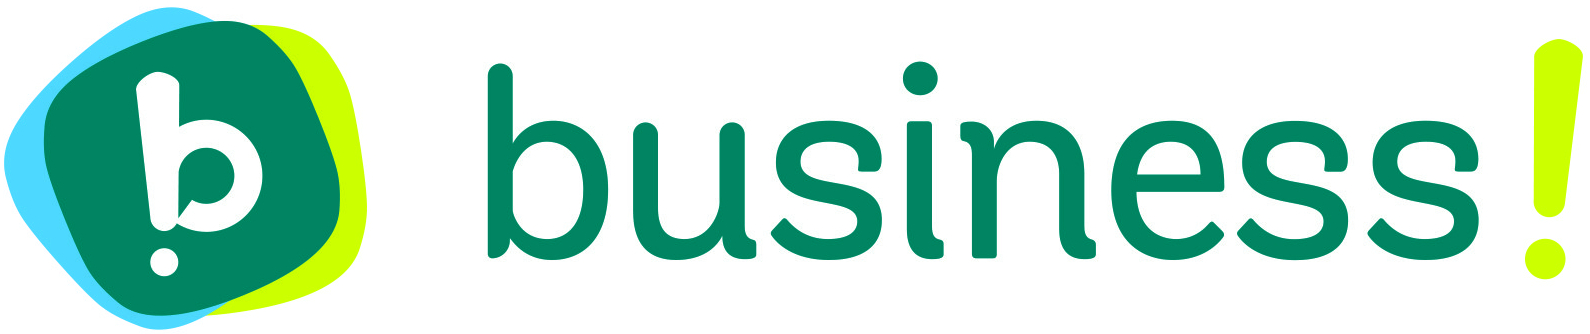 NetPlus Business